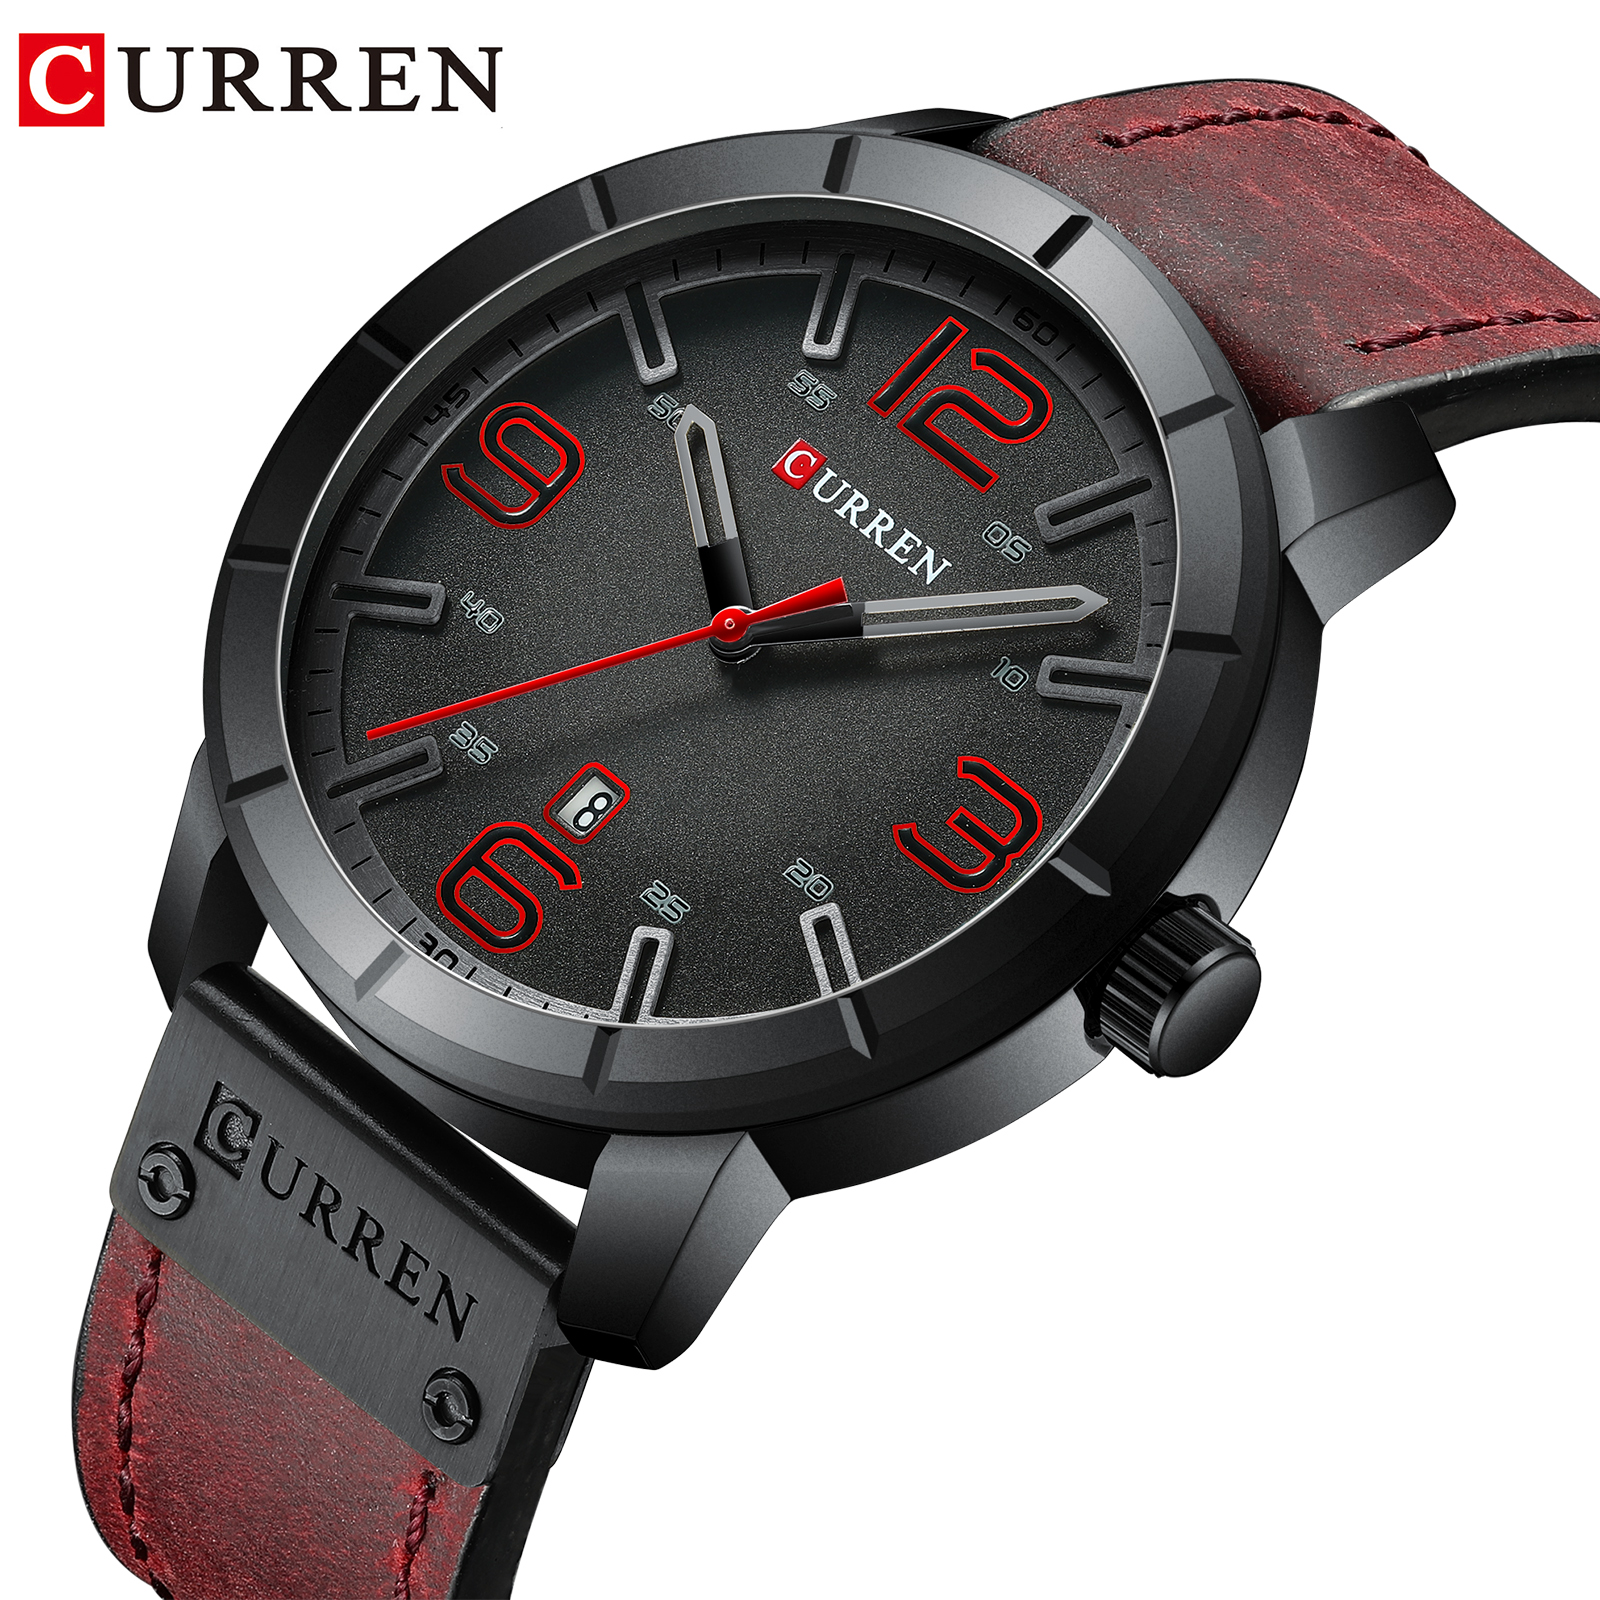 CURREN Men Sports Leather Watch Luxury Brand Watches Quartz Wristwatch Business Calendar Clock Reloj Hombres